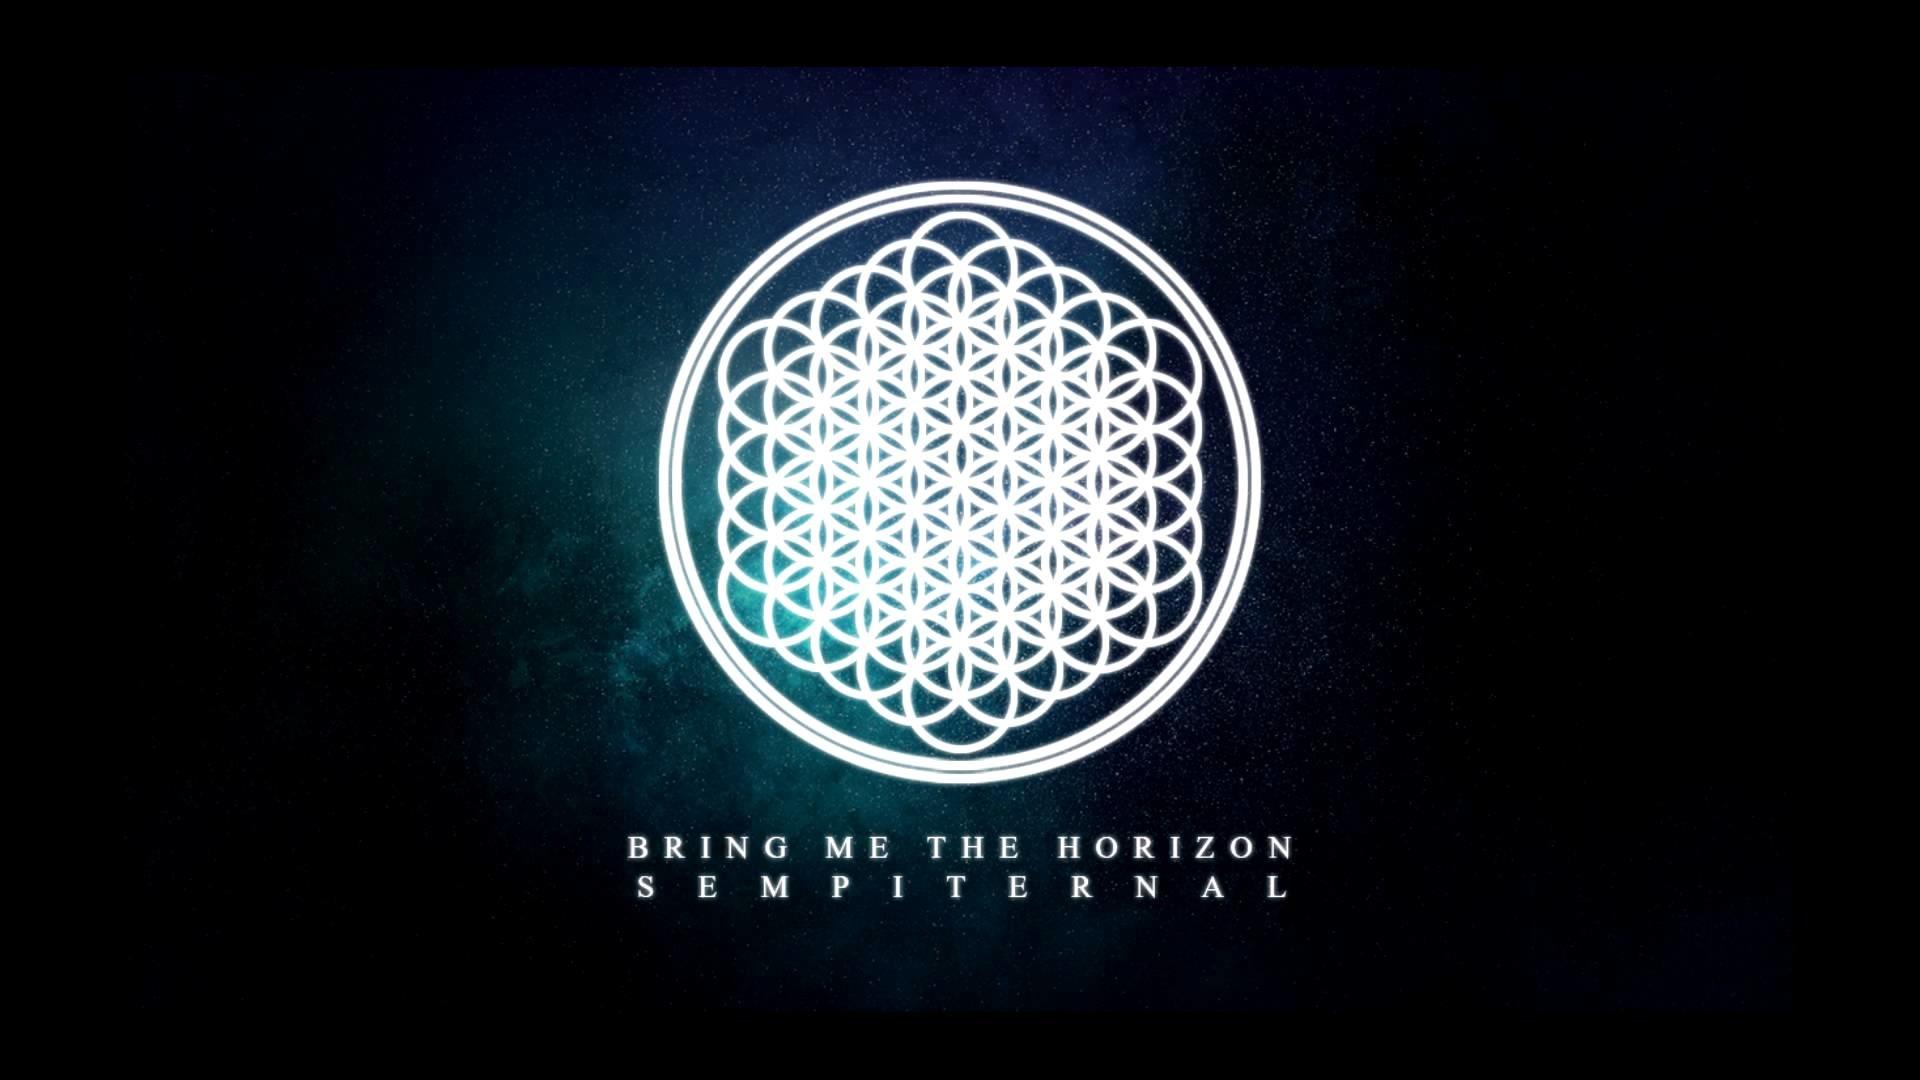 Bring Me The Horizon 2018 Wallpaper 1